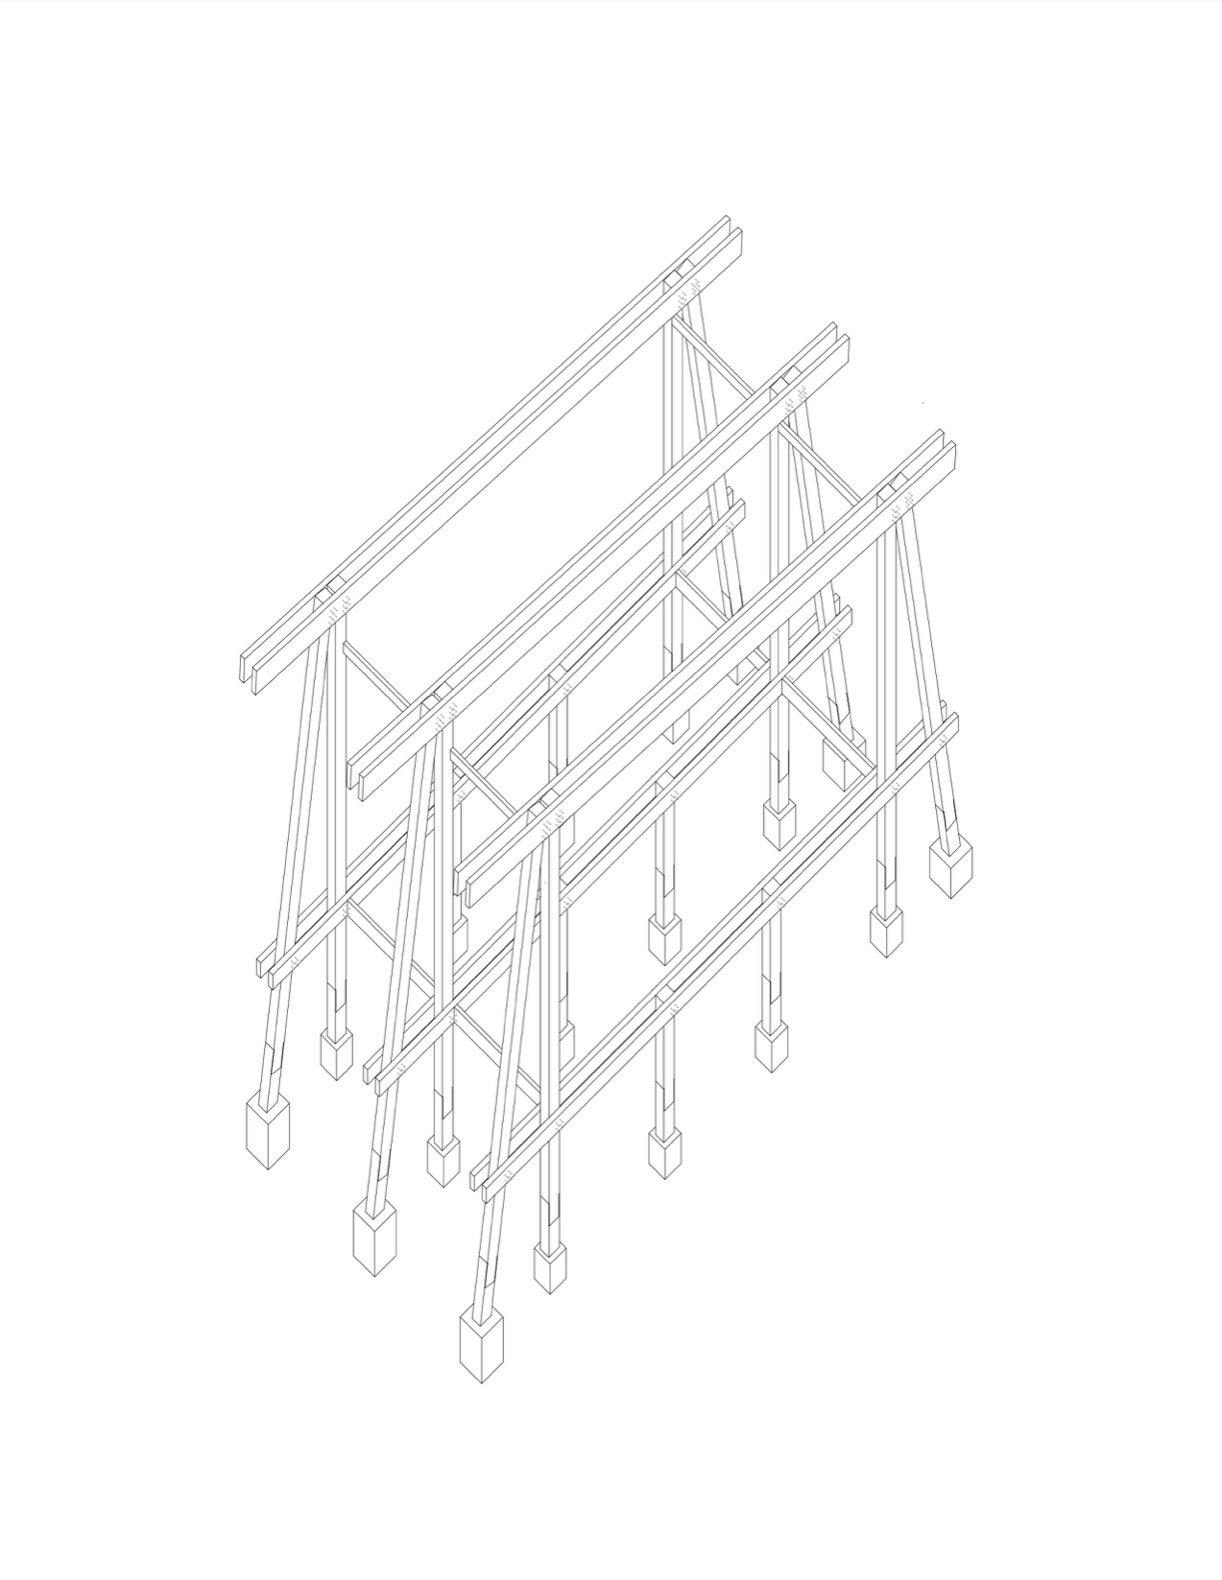 Patio House in Lago Ranco structural diagram